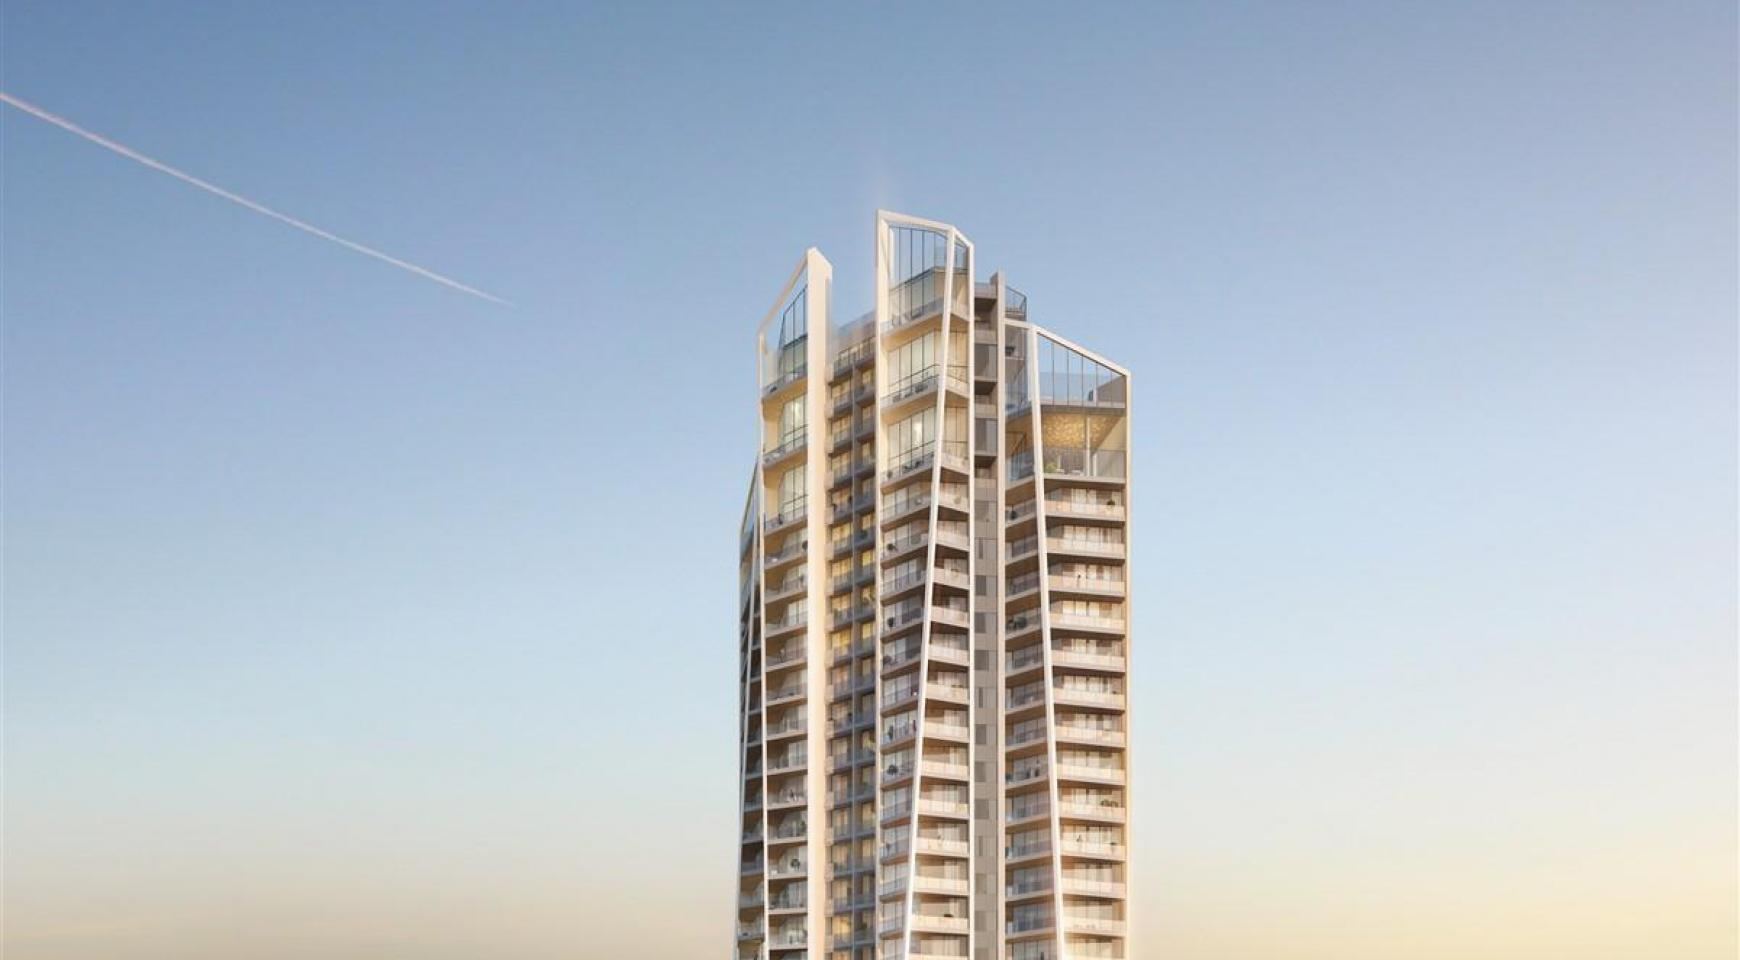 Sky Tower. Μοντέρνο ευρύχωρο διαμέρισμα ενός υπνοδωματίου με θέα στην θάλασσα - 4